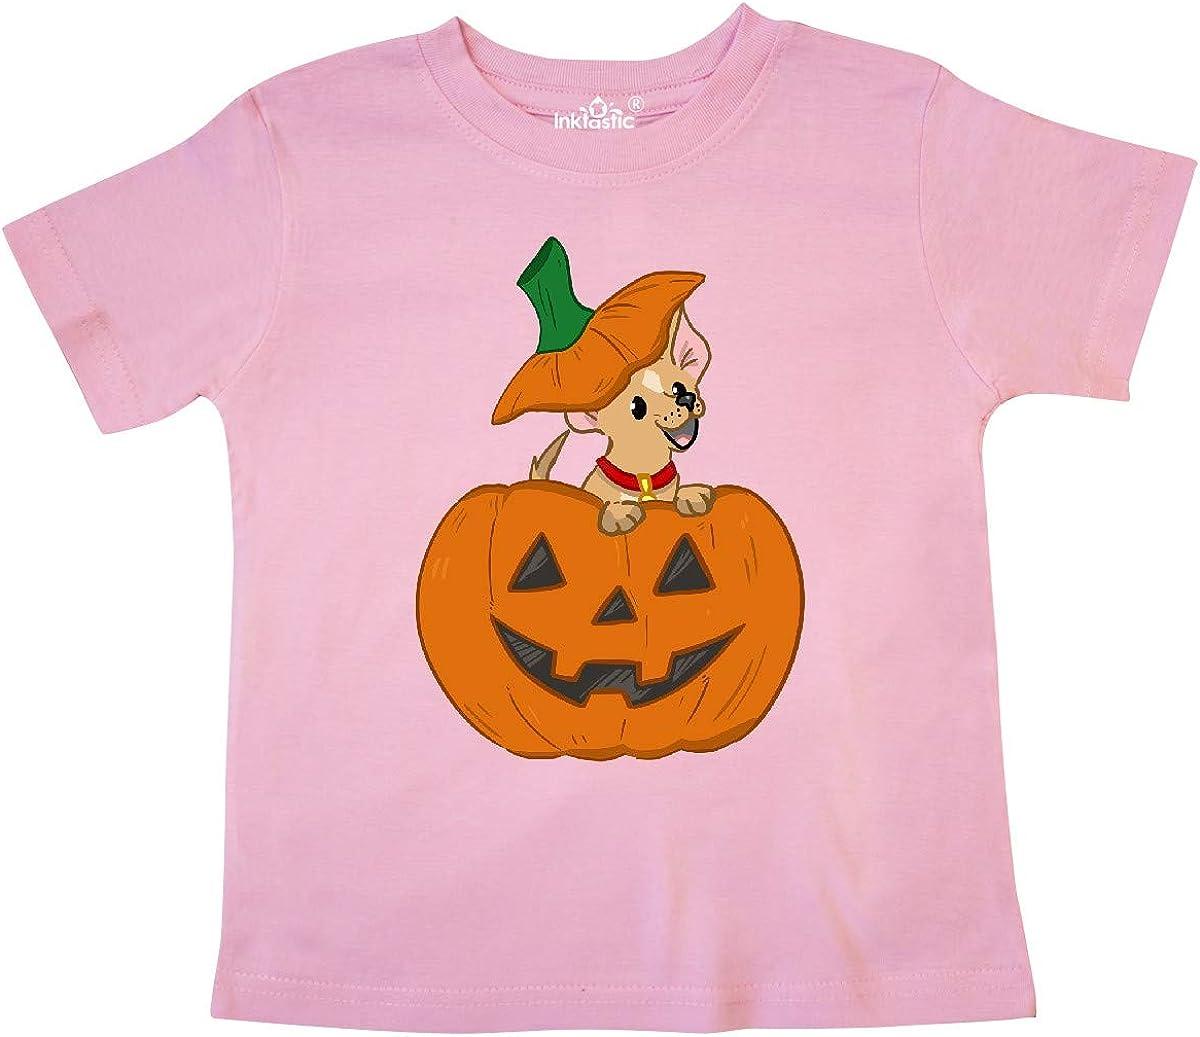 inktastic Halloween Chihuahua Pumpkin Toddler T-Shirt